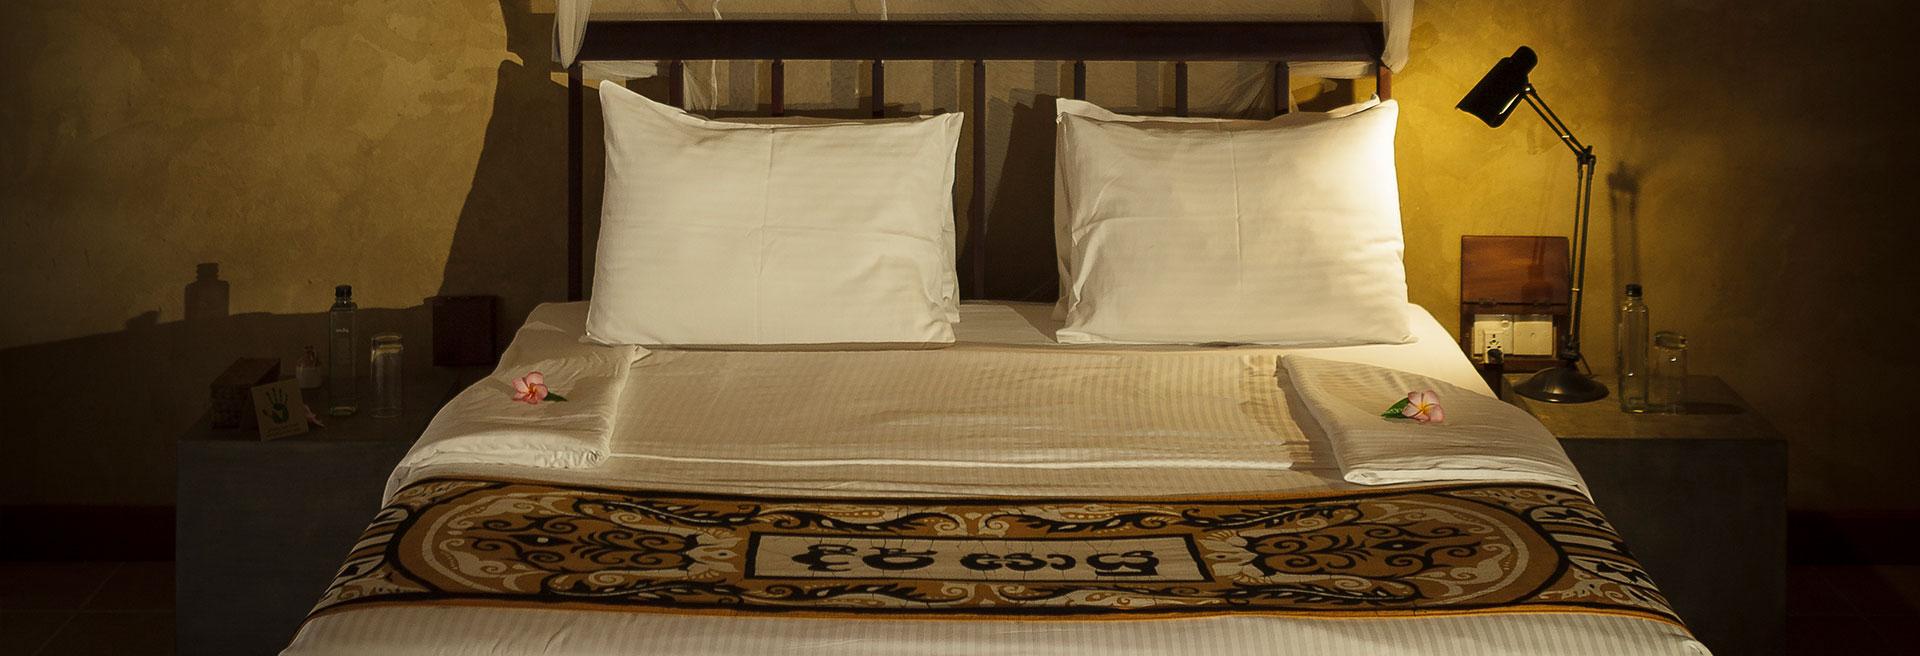 Luxury And Comfortable Double Bedroom